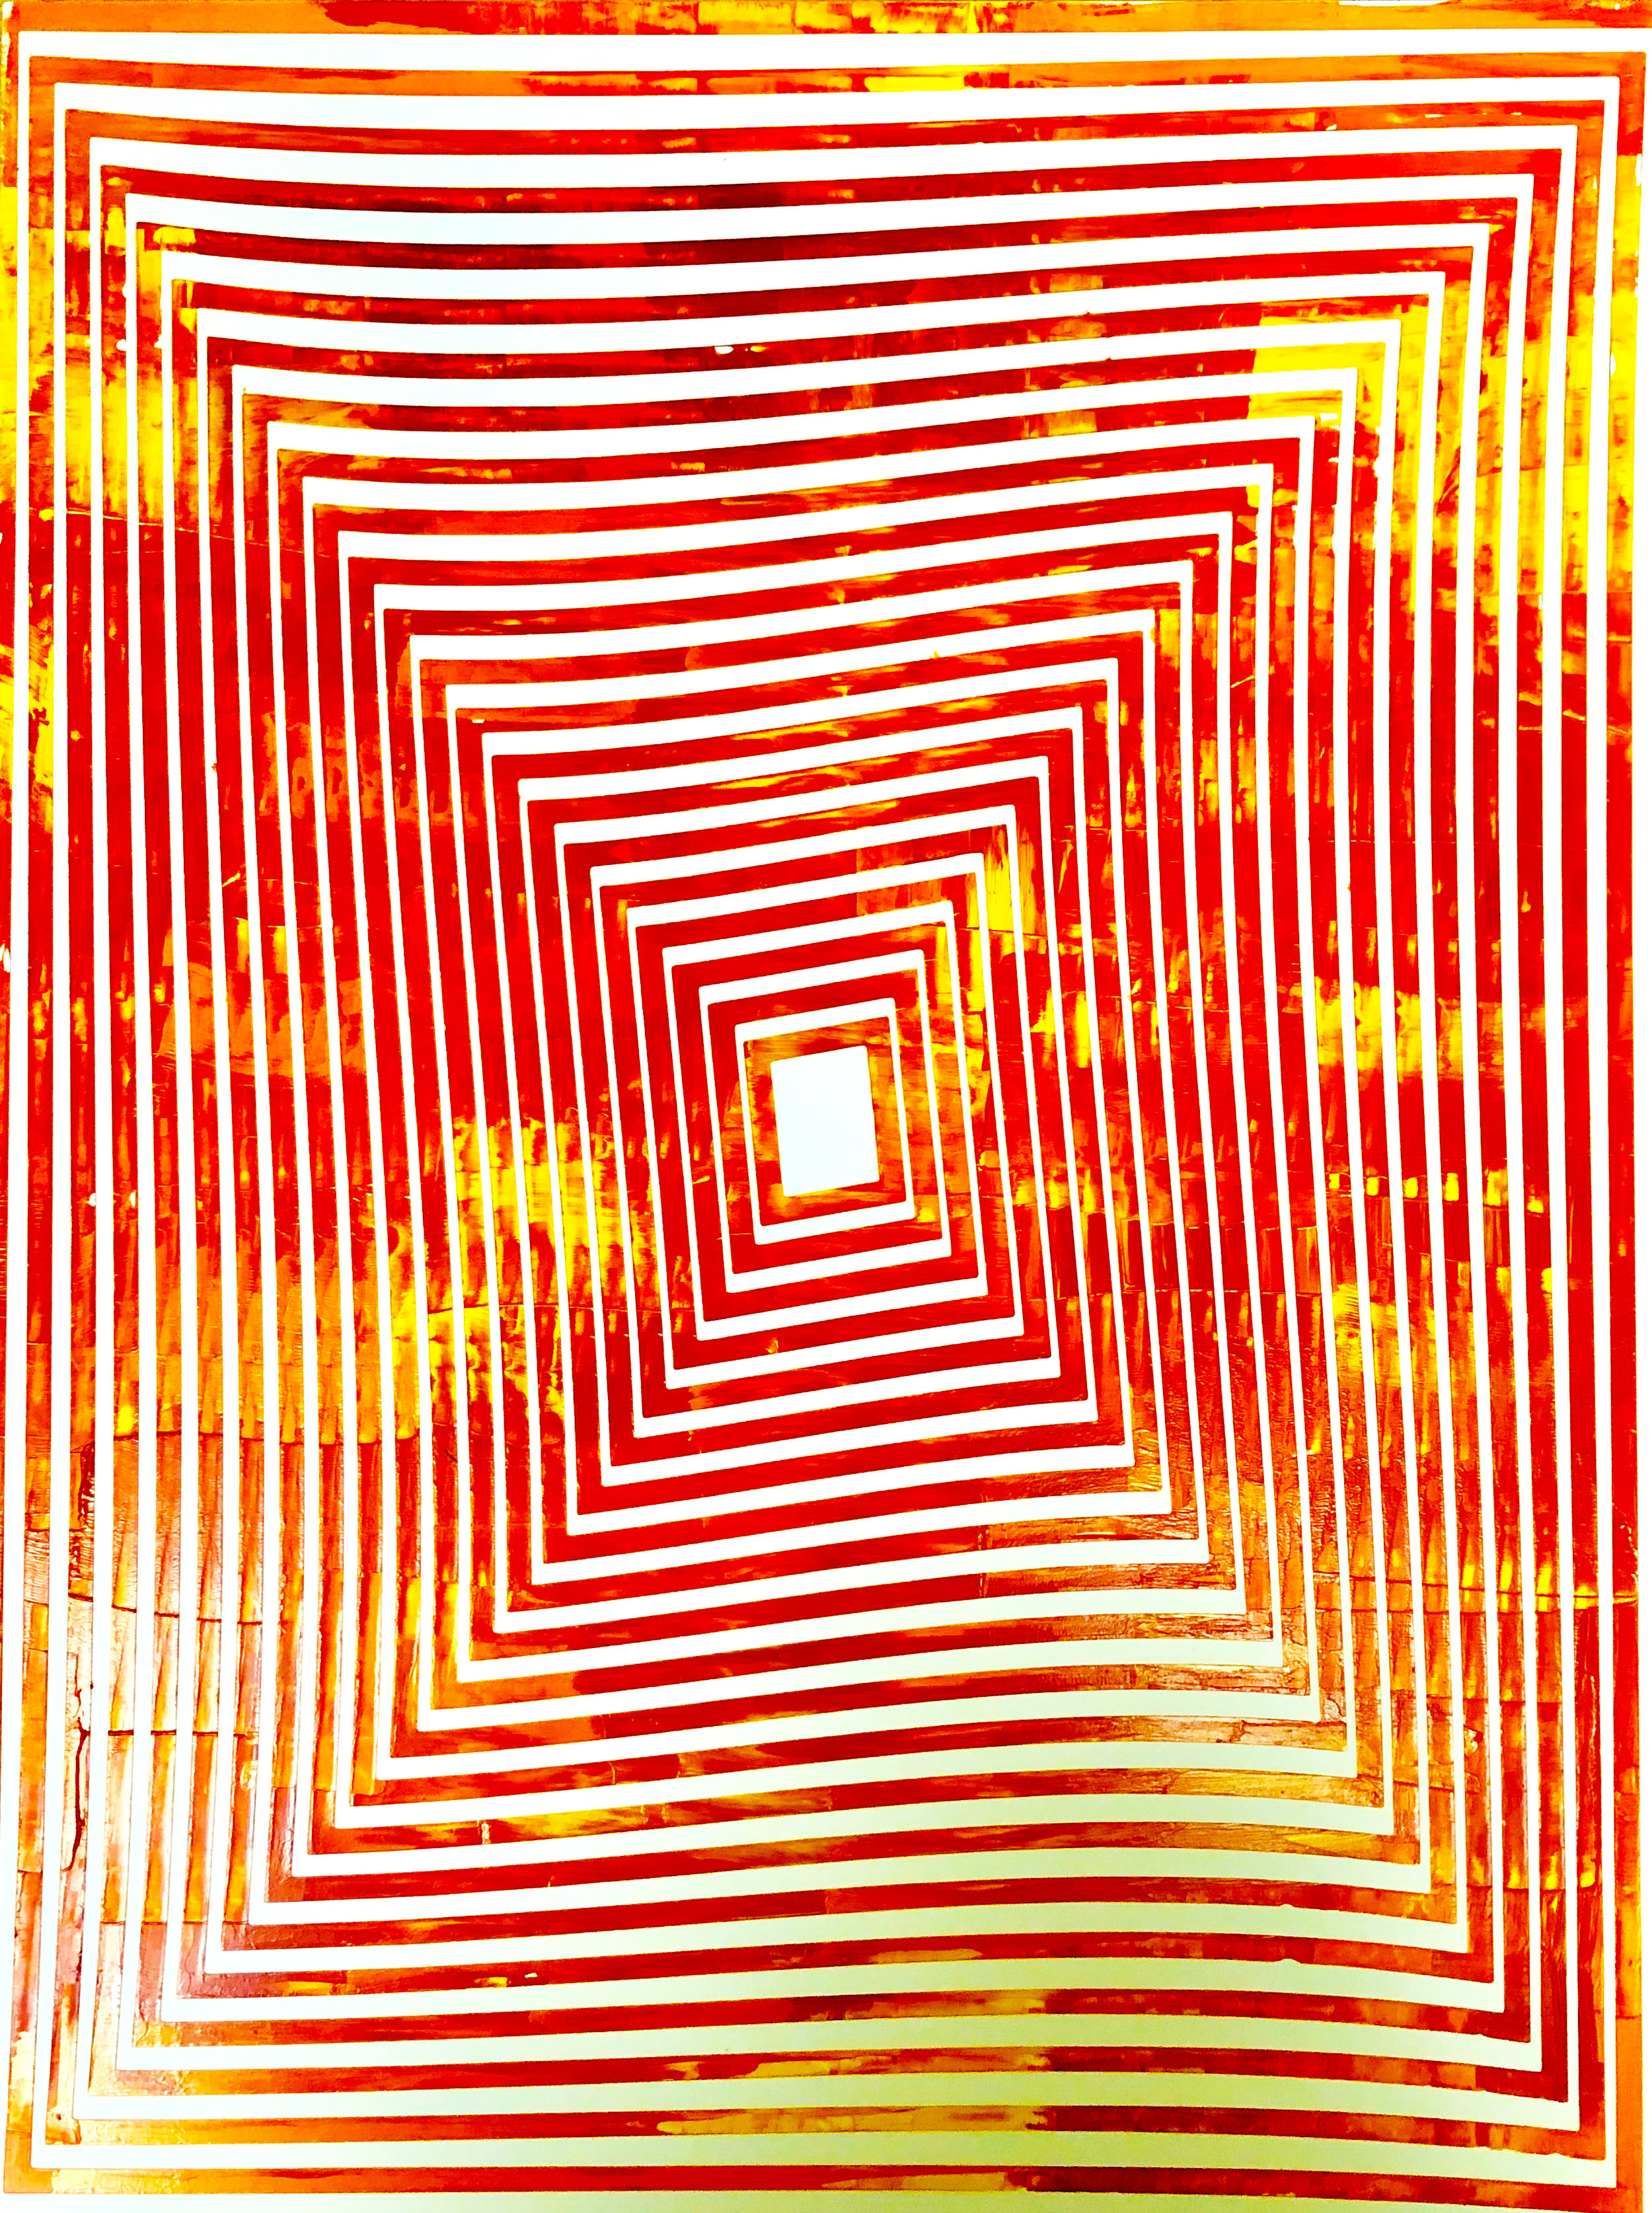 HUE Gallery of Contemporary Art - Sean Christopher Ward - Purgatory - Acrylic on MDF - 12x16 - 2018 - $375.JPG